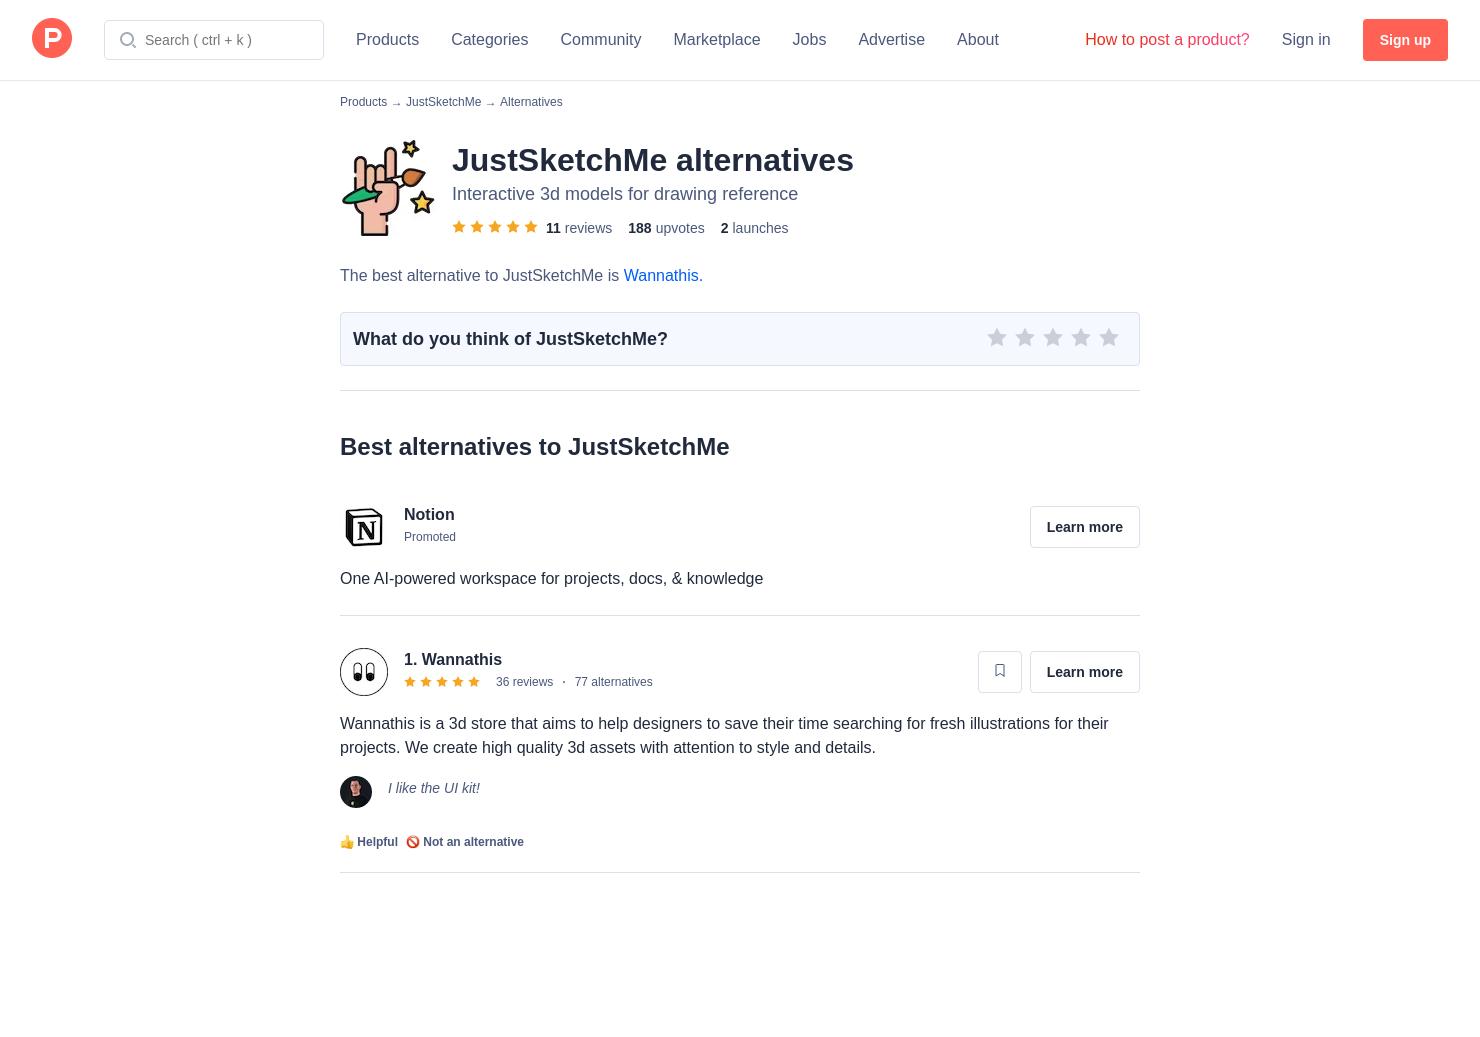 7 Alternatives to JustSketchMe | Product Hunt